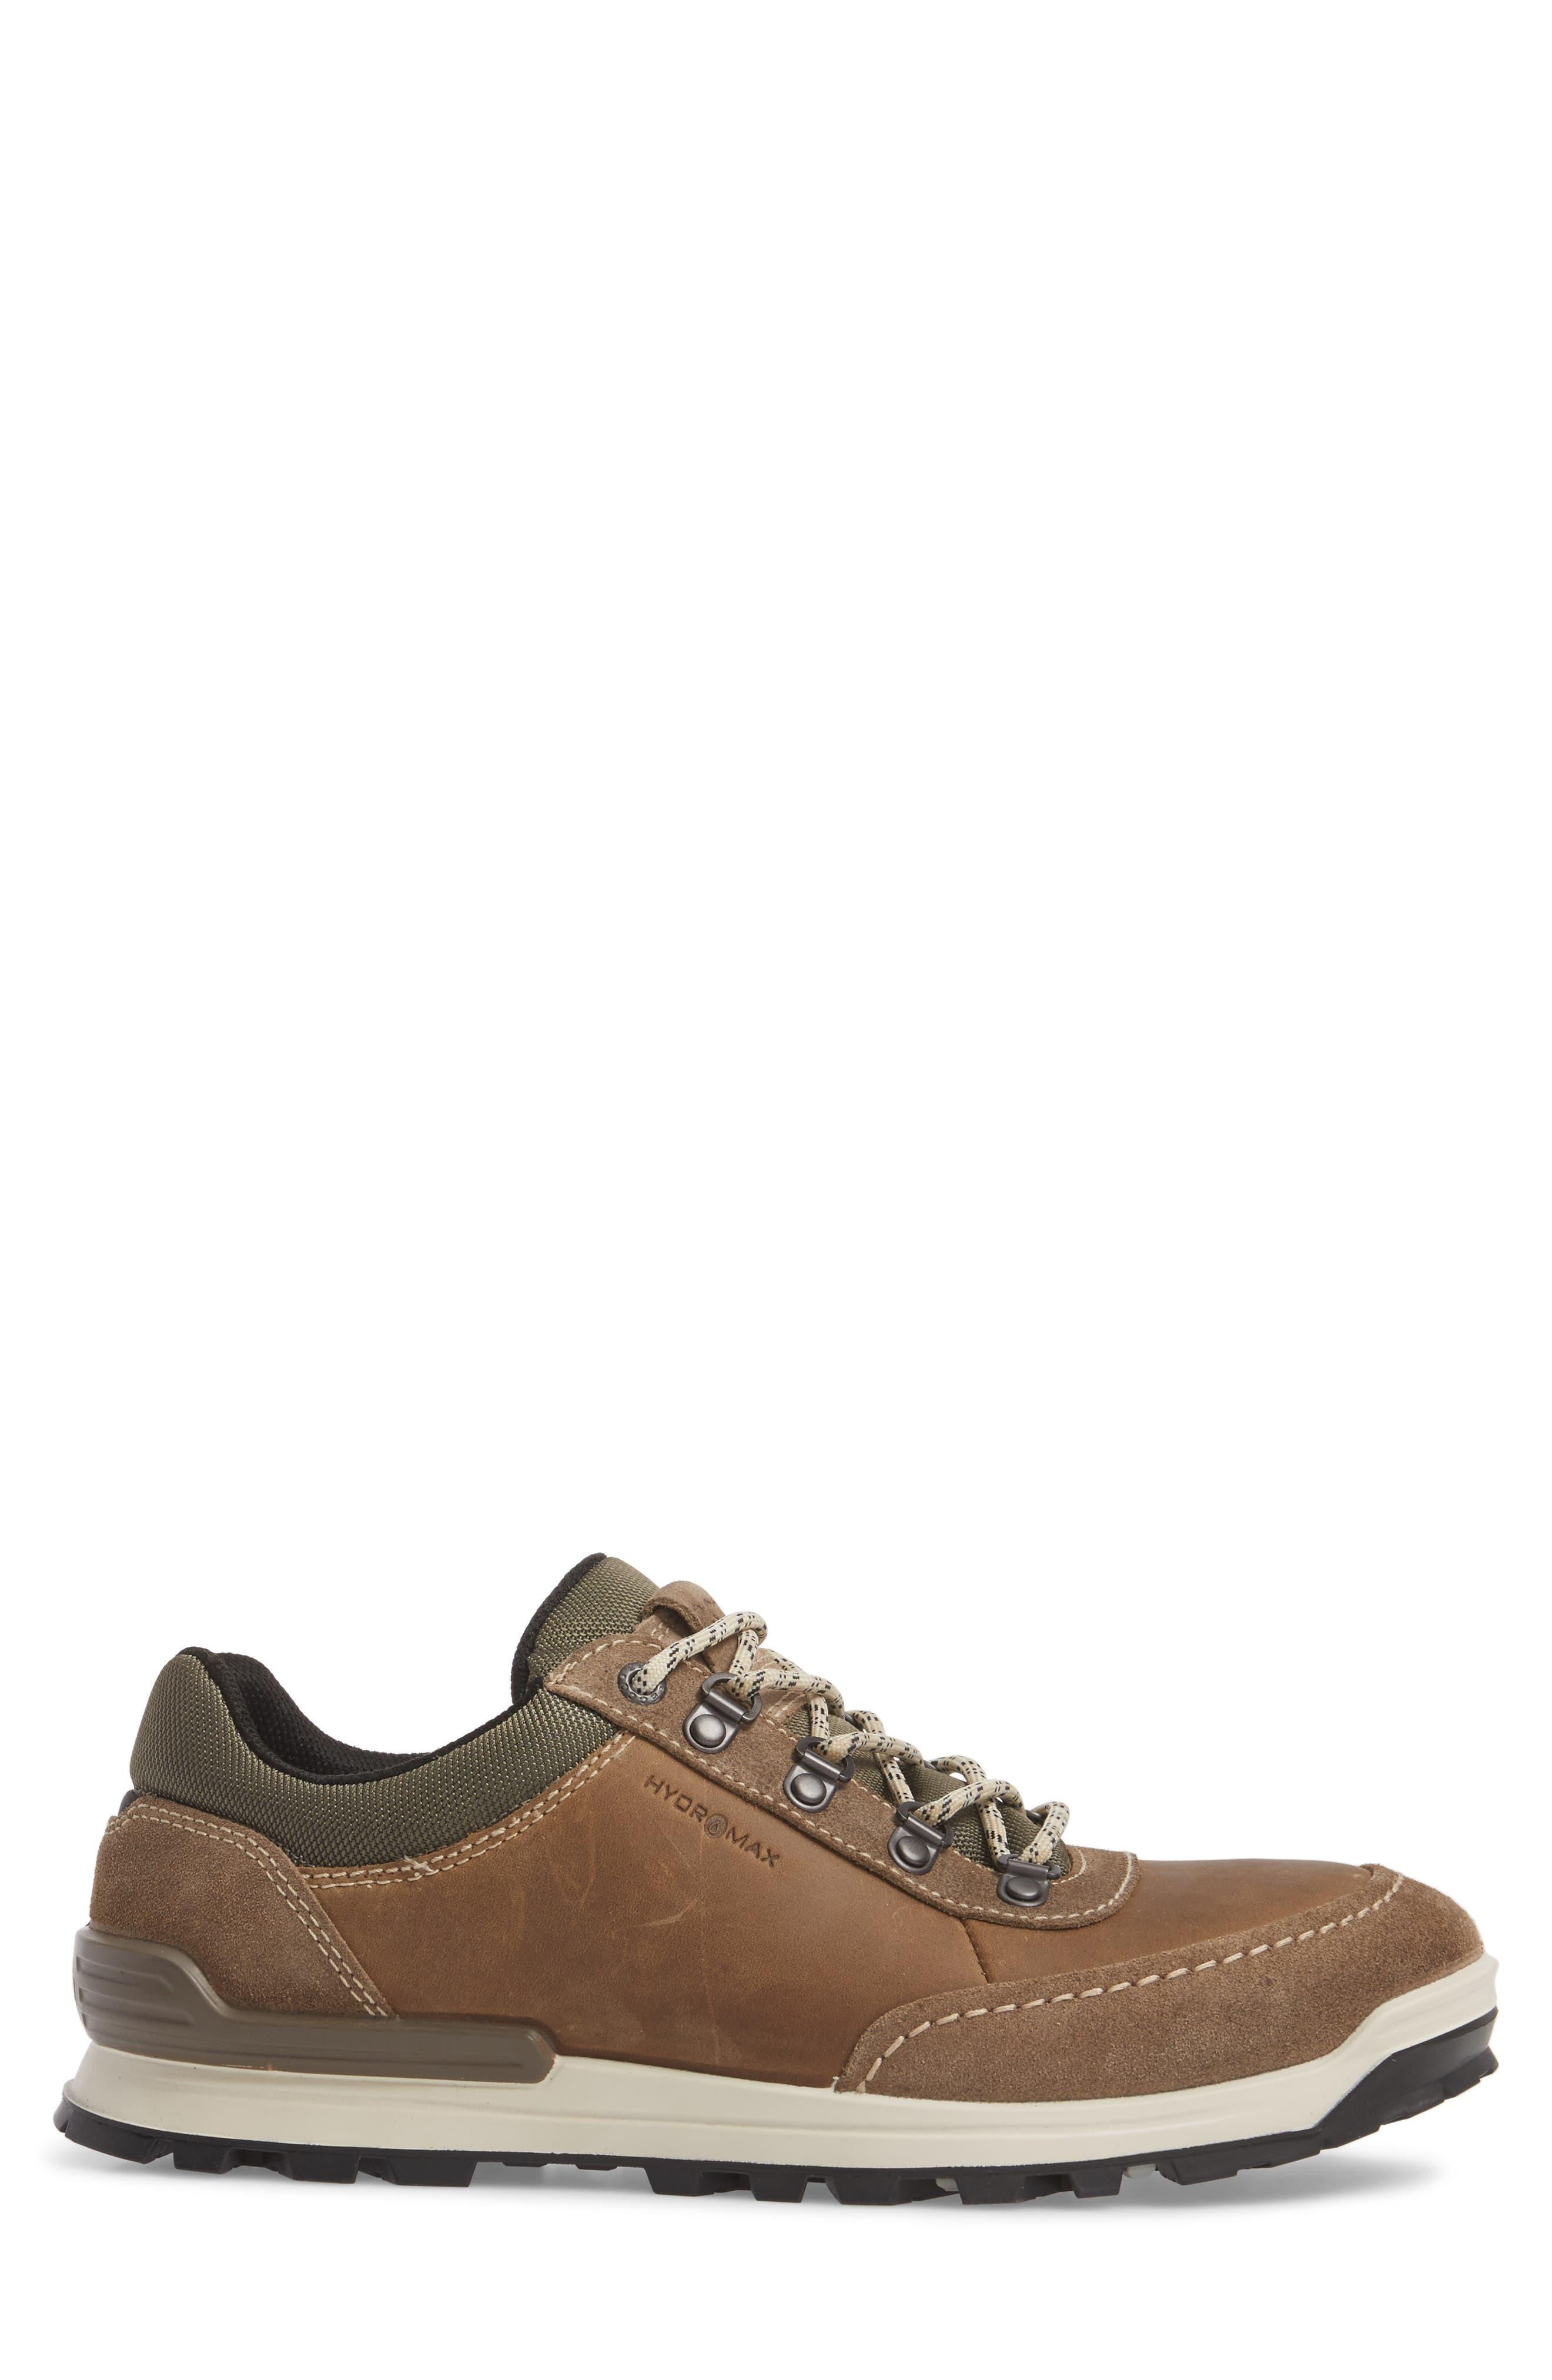 Oregon Sneaker,                             Alternate thumbnail 3, color,                             Brown Leather